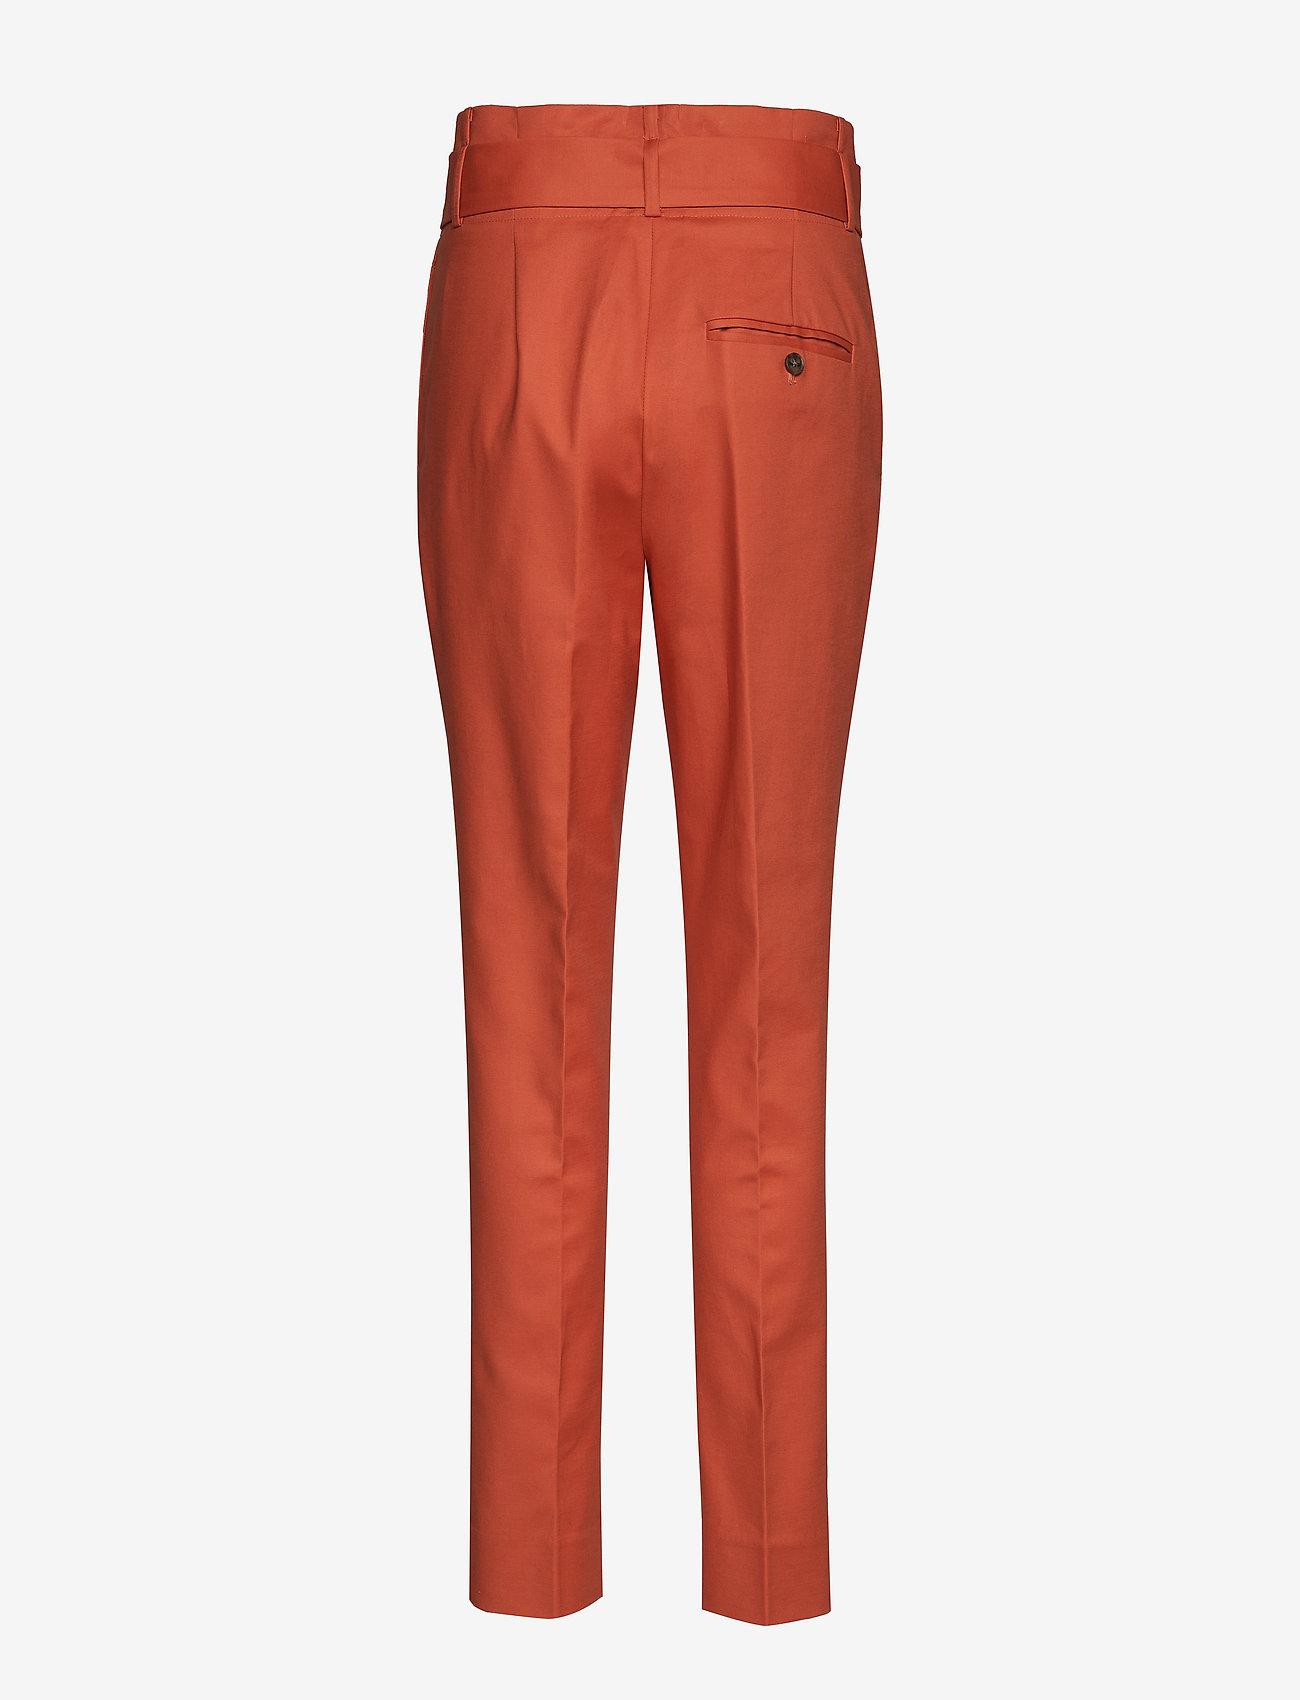 Noa Noa - Trousers - straight leg trousers - mecca orange - 1